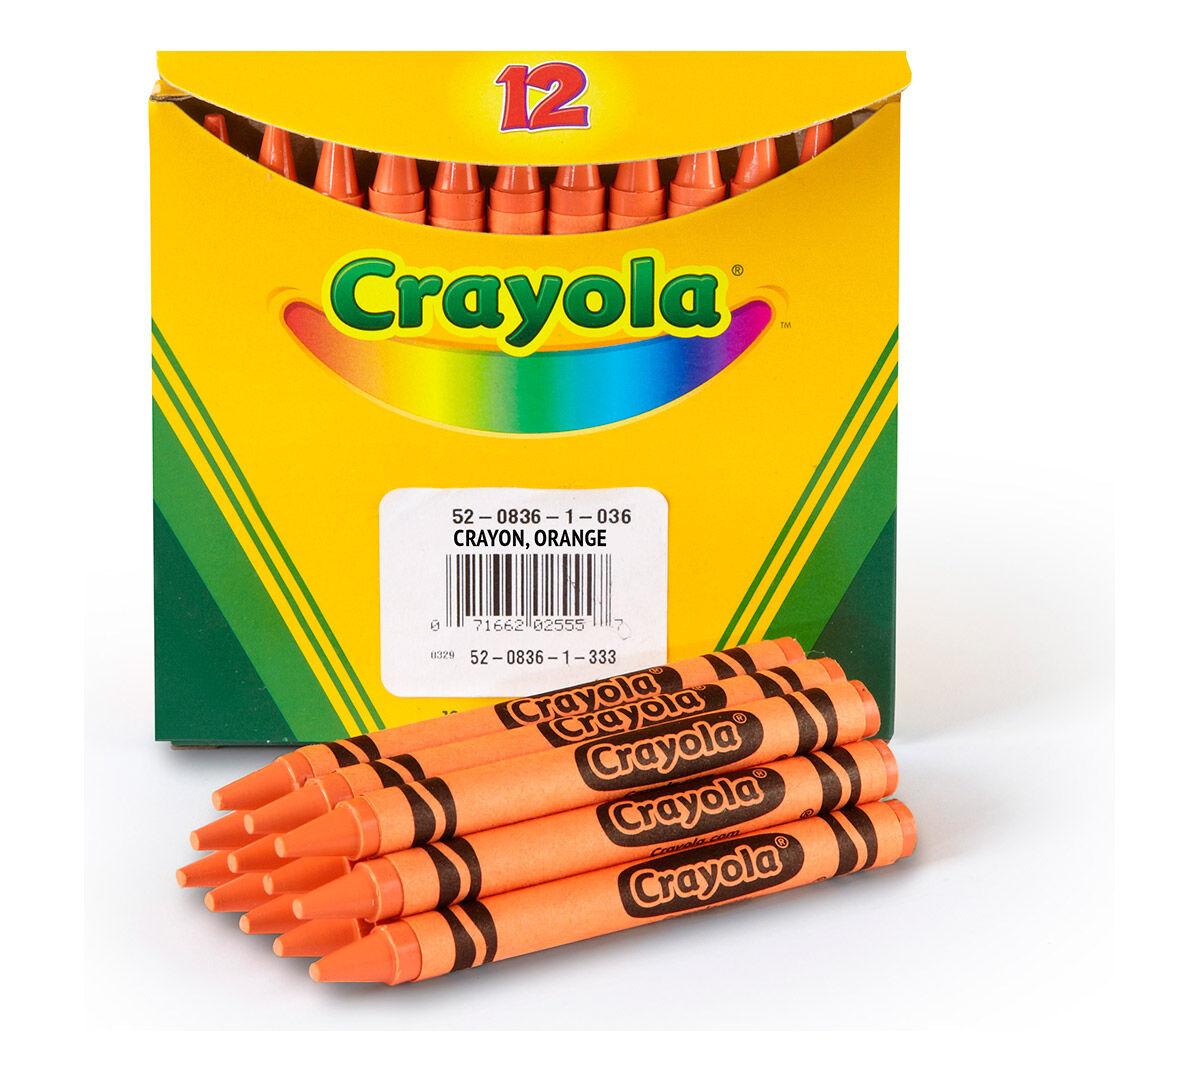 Crayola 12 Count Original Bulk Markers Orange